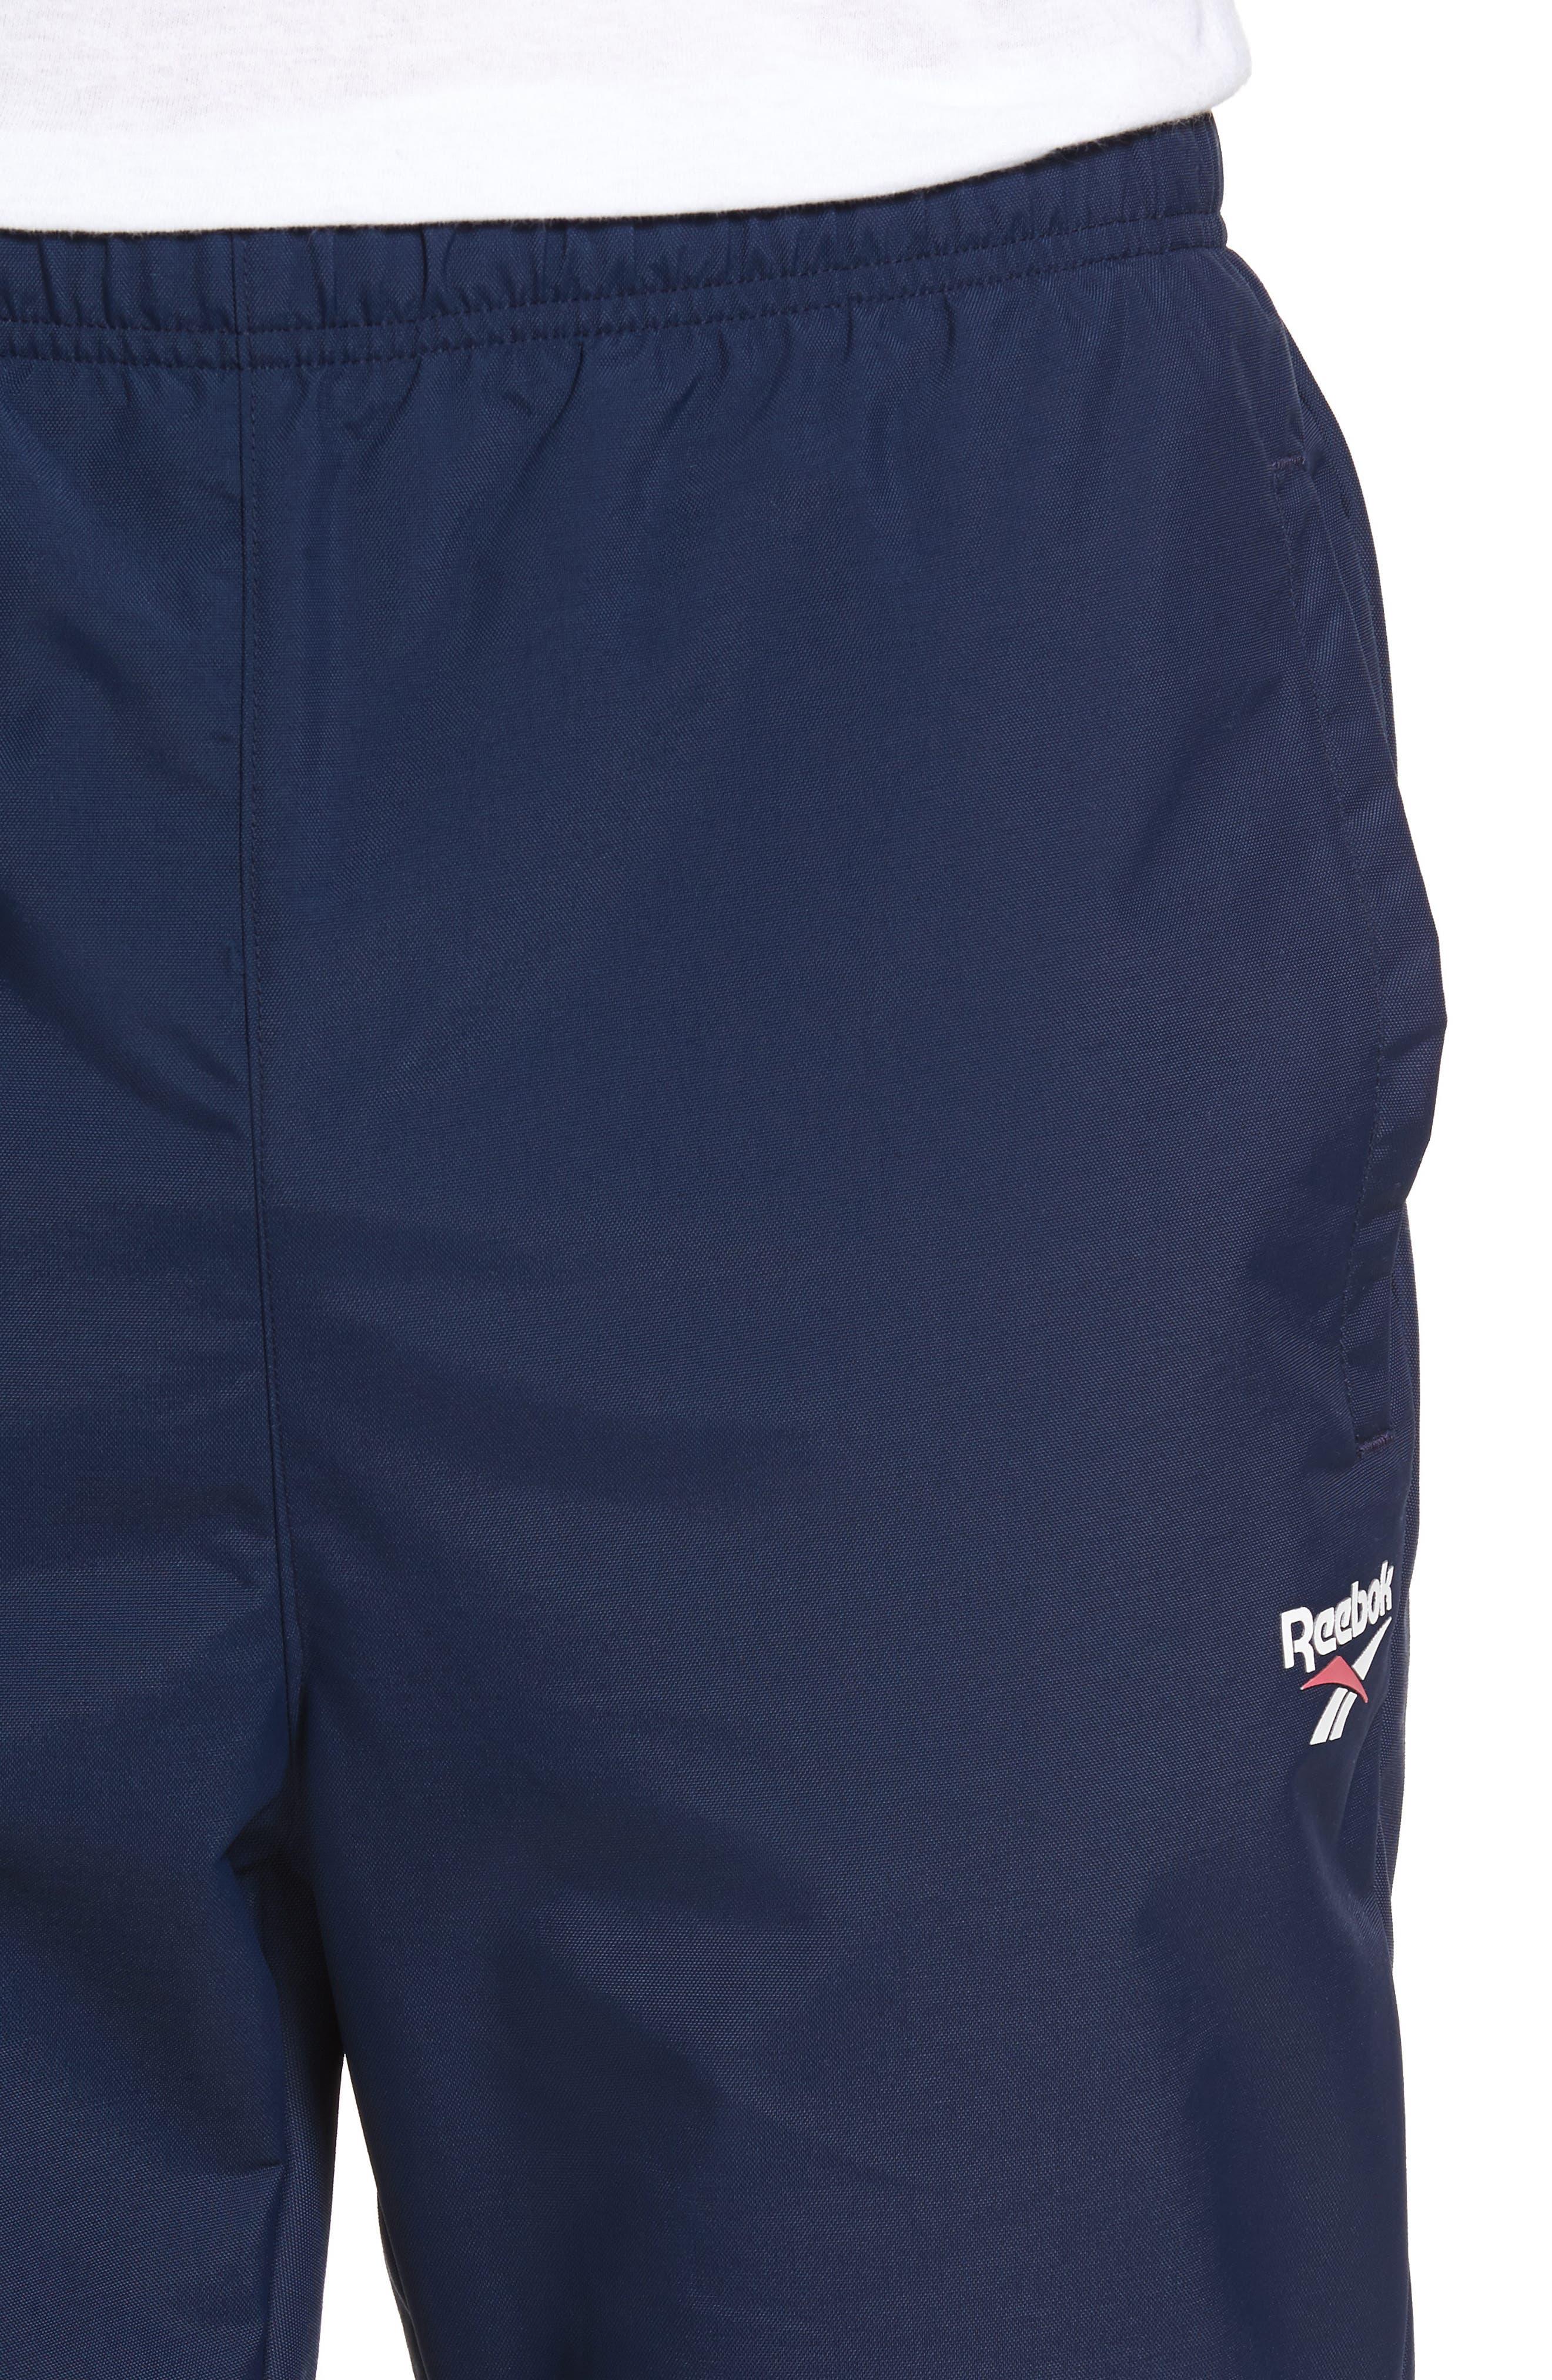 Classics Track Pants,                             Alternate thumbnail 4, color,                             Collegiate Navy